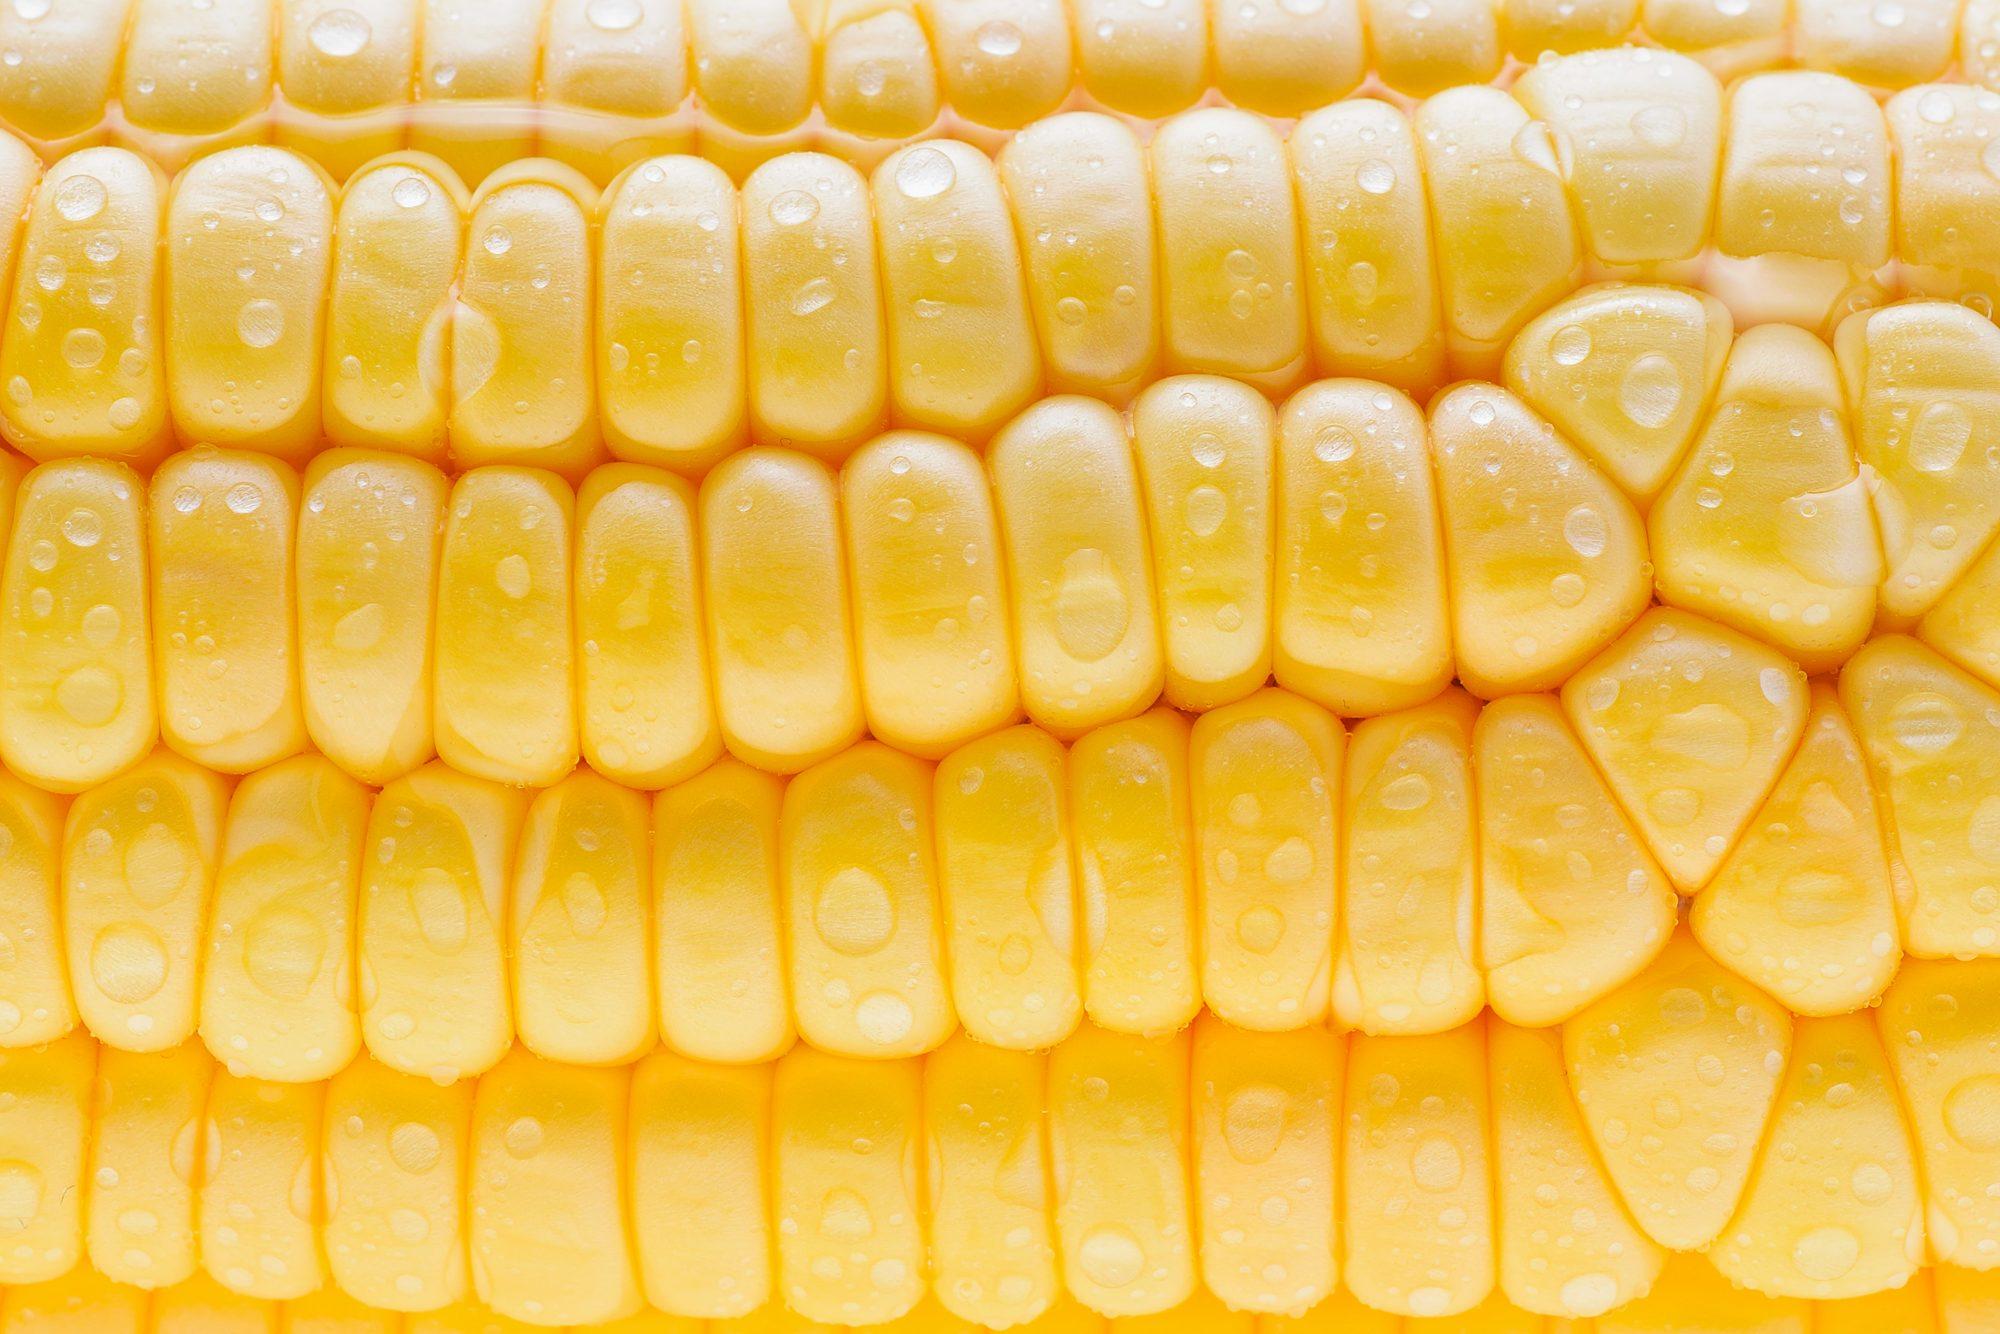 Corn Getty 10/23/19